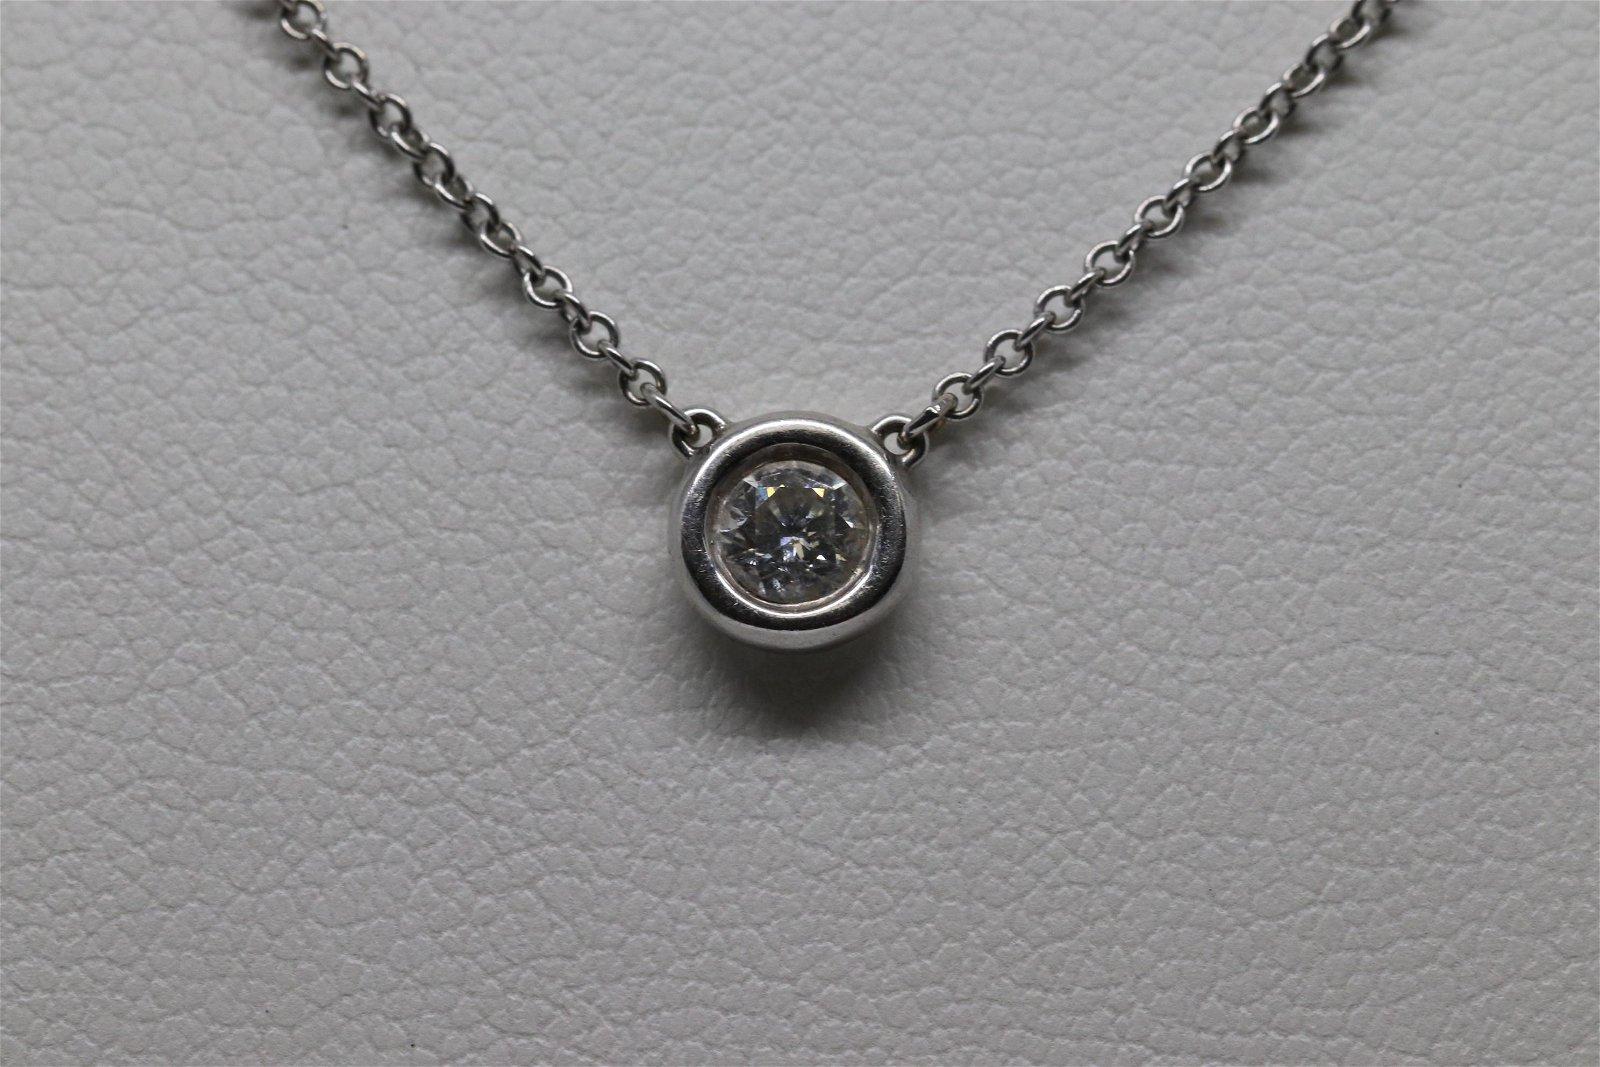 14Kt Diamond Solitare Necklace